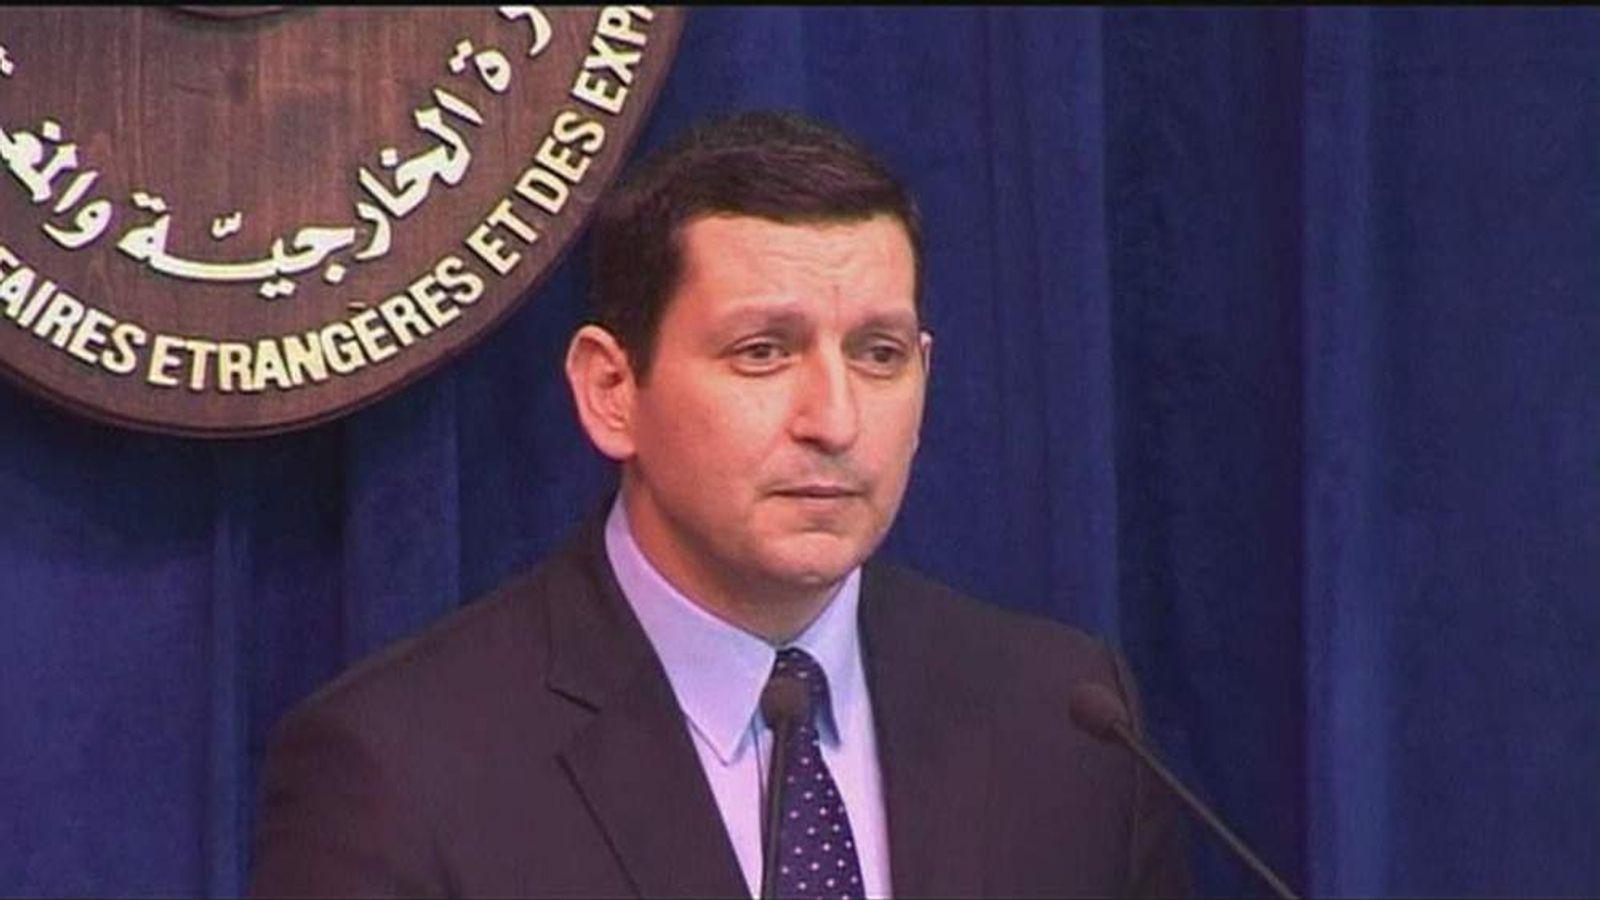 Foreign Ministry spokesman Jihad Makdissi